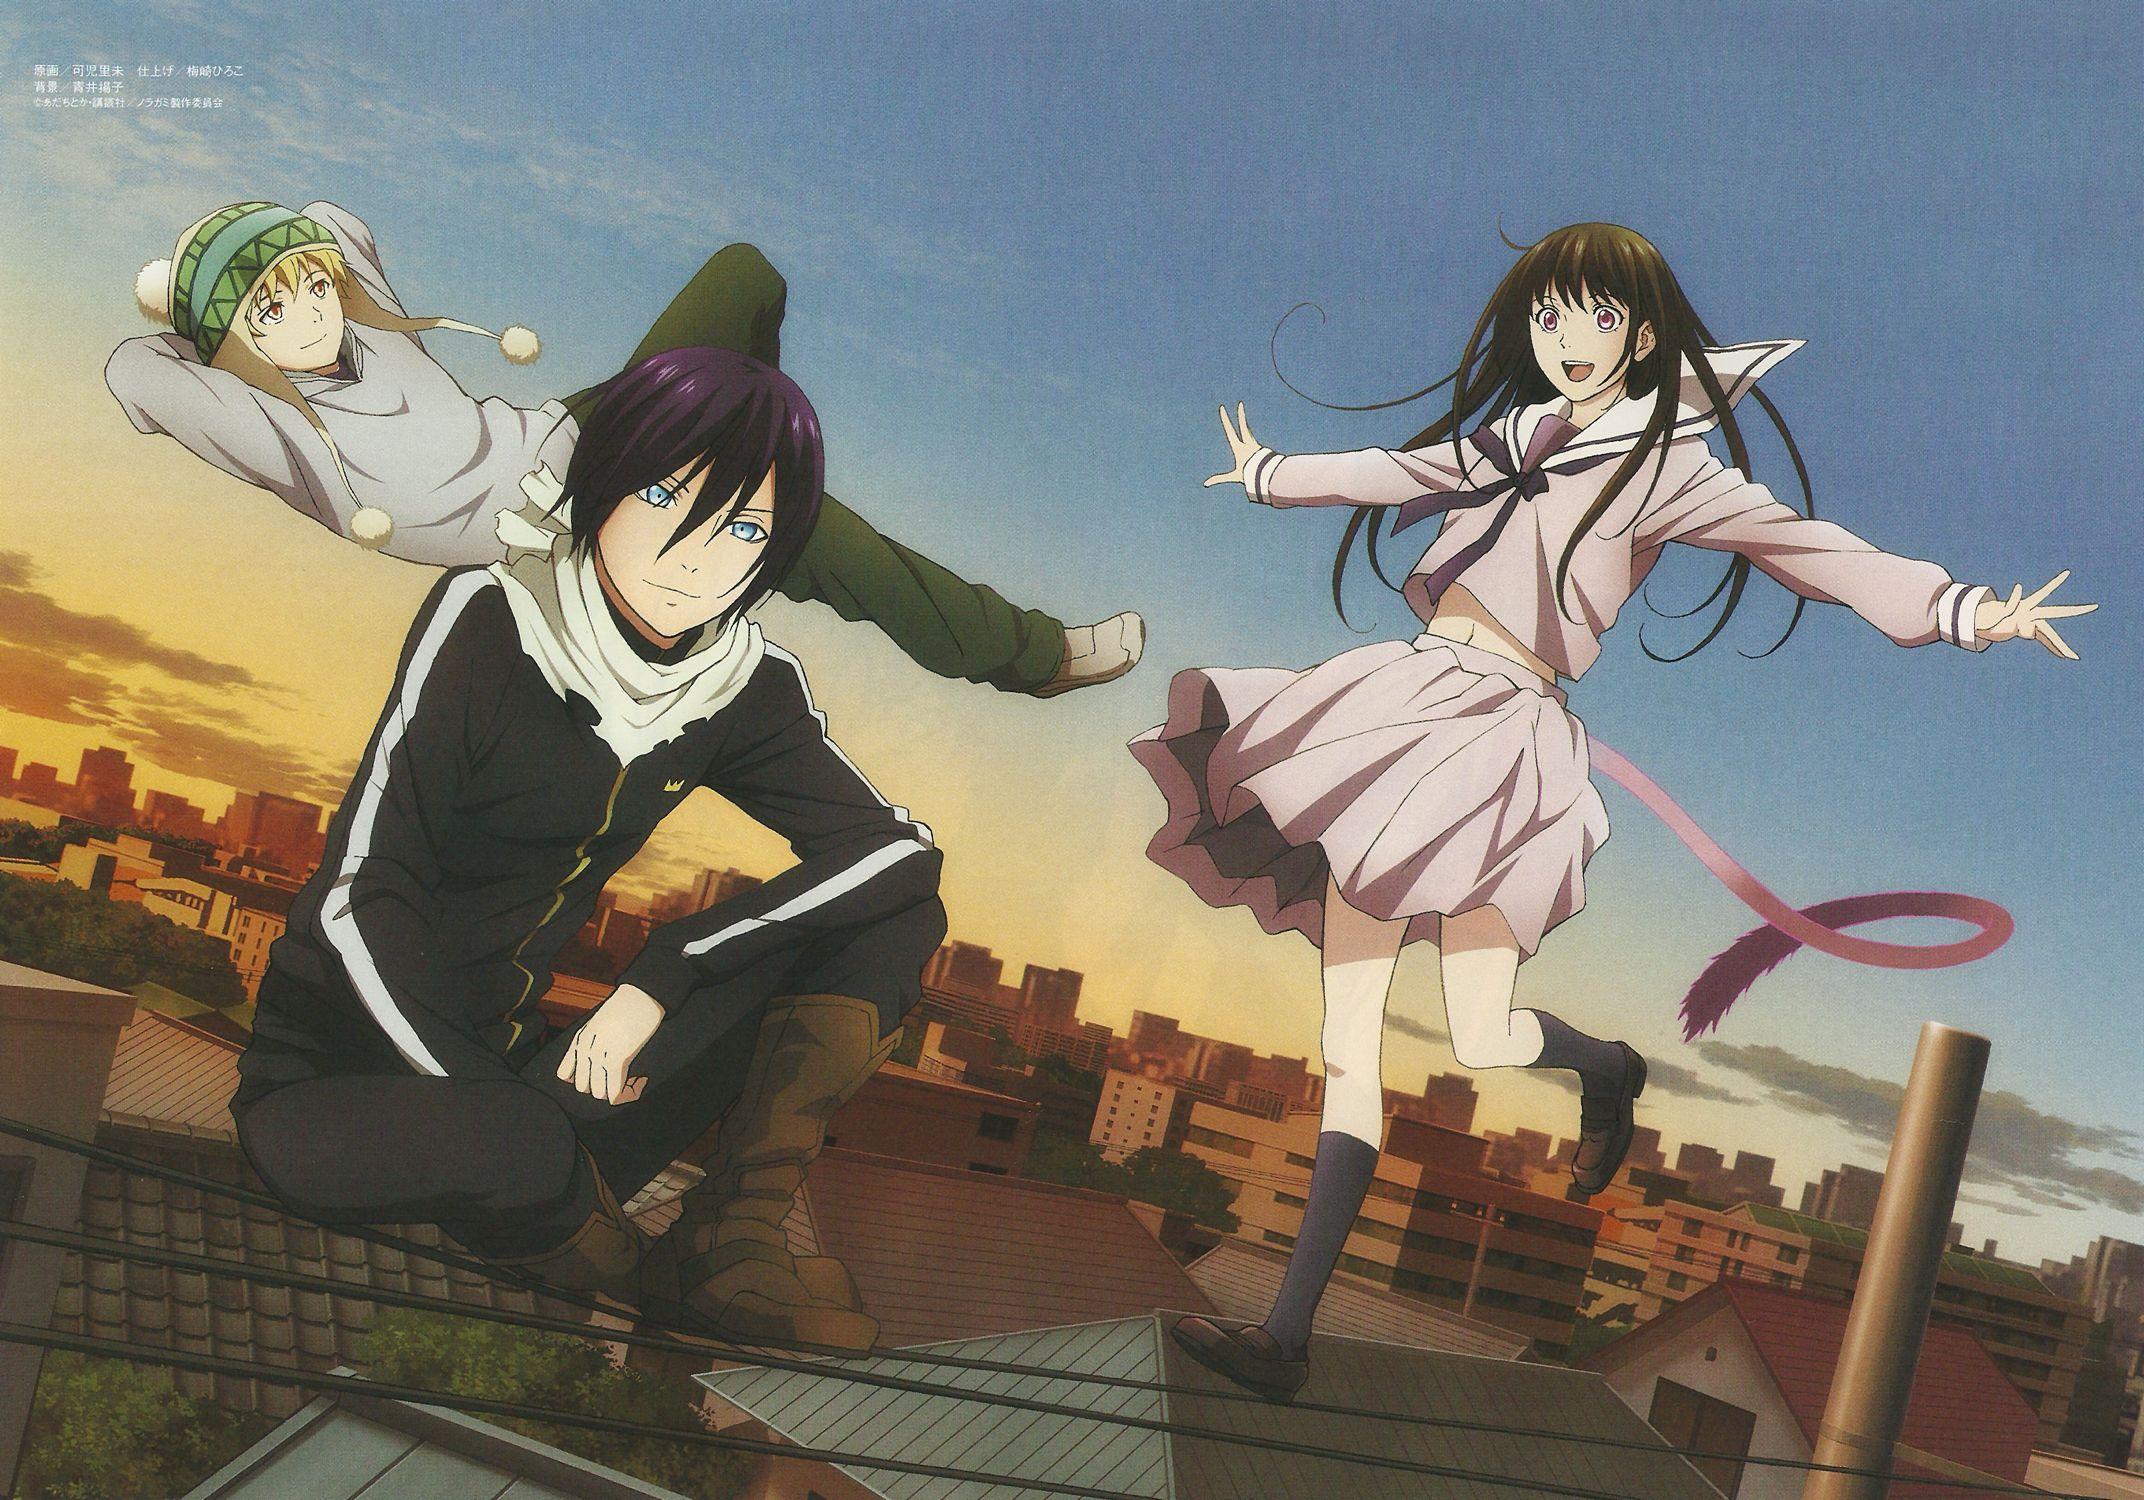 Noragami Anime Wallpaper